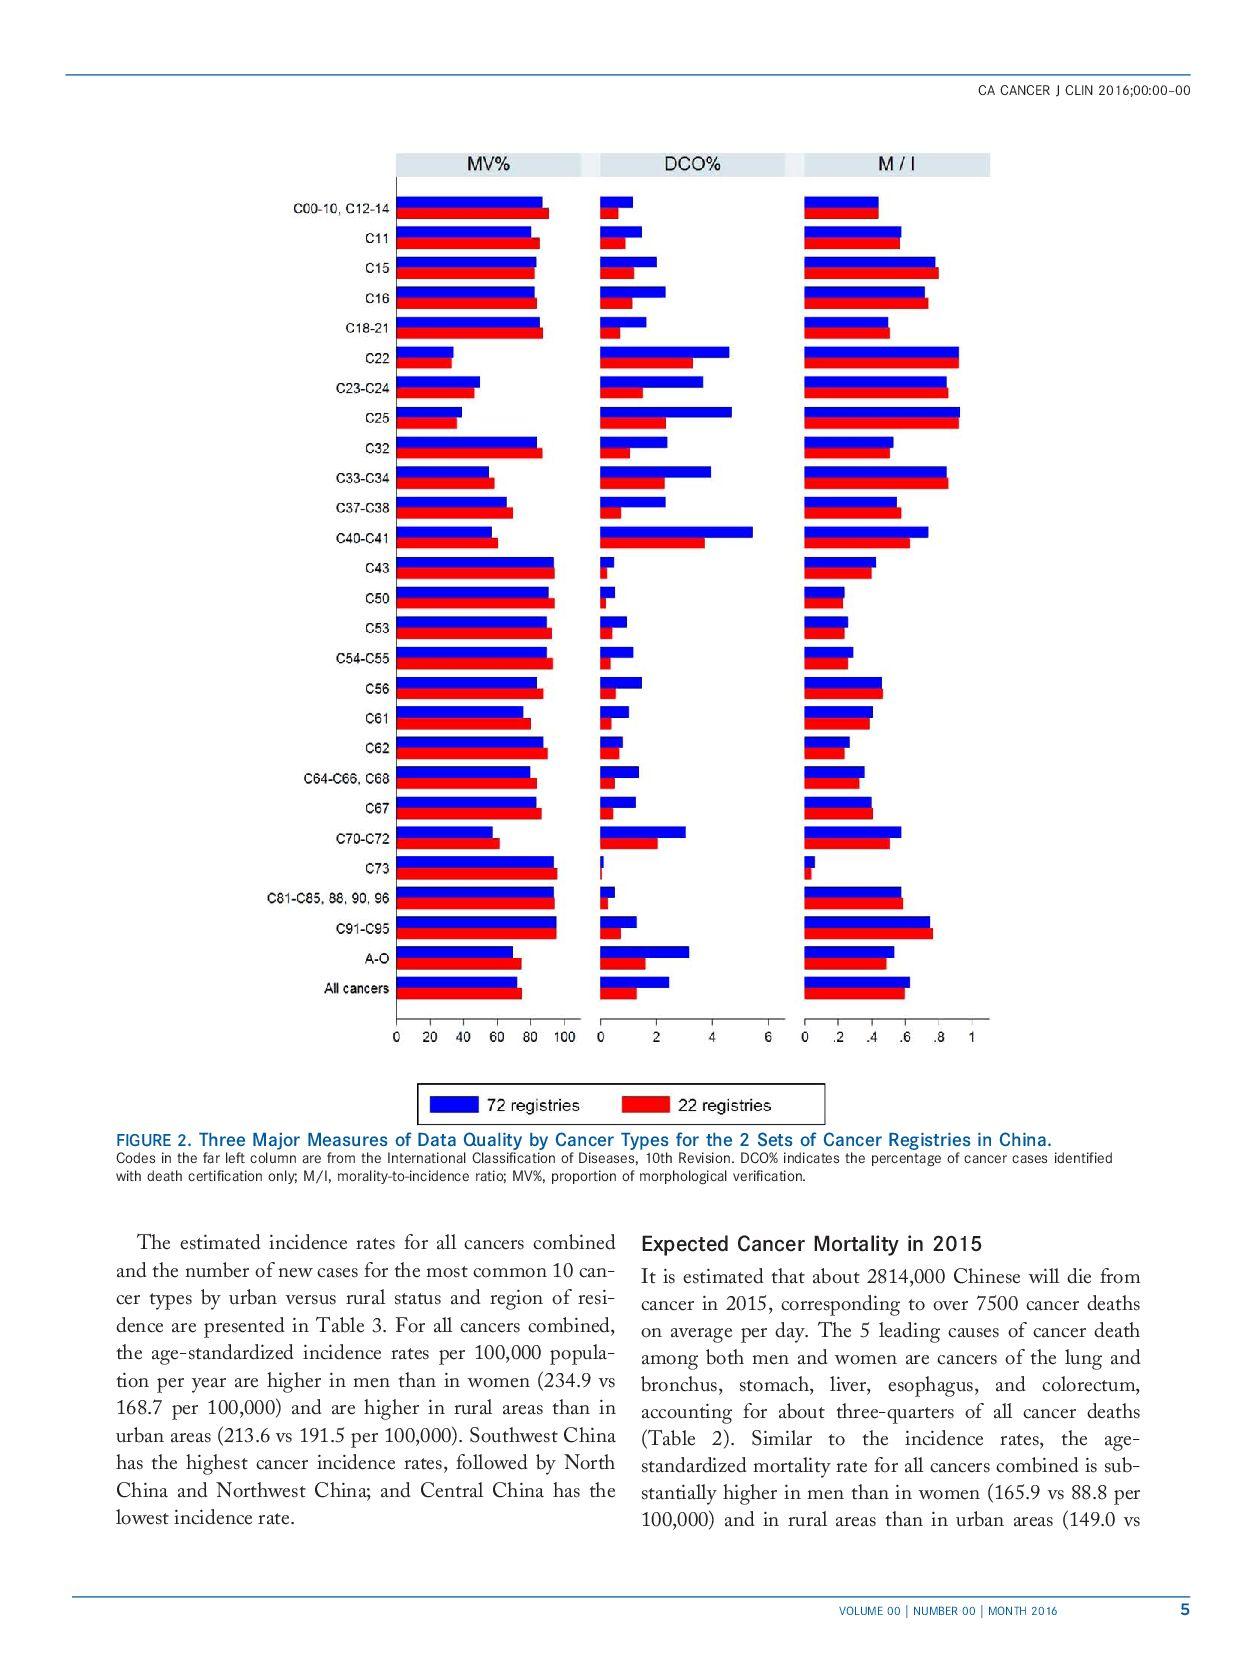 cancer-statistics-in-china-2016-5